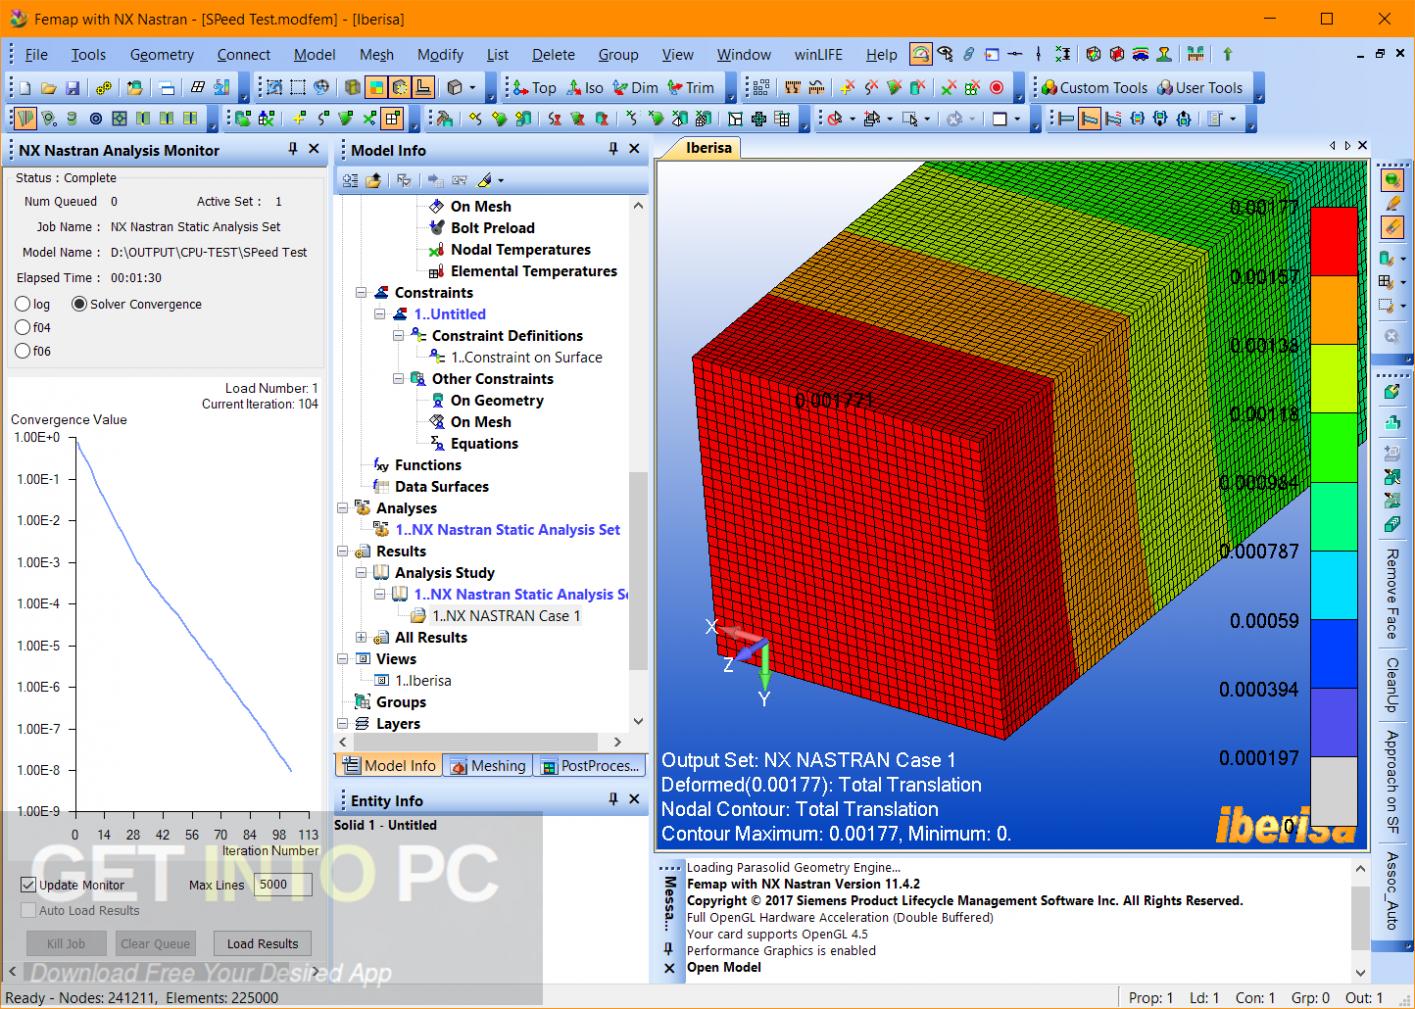 Siemens FEMAP 11.4.2 with NX Nastran x64 Latest Version Download